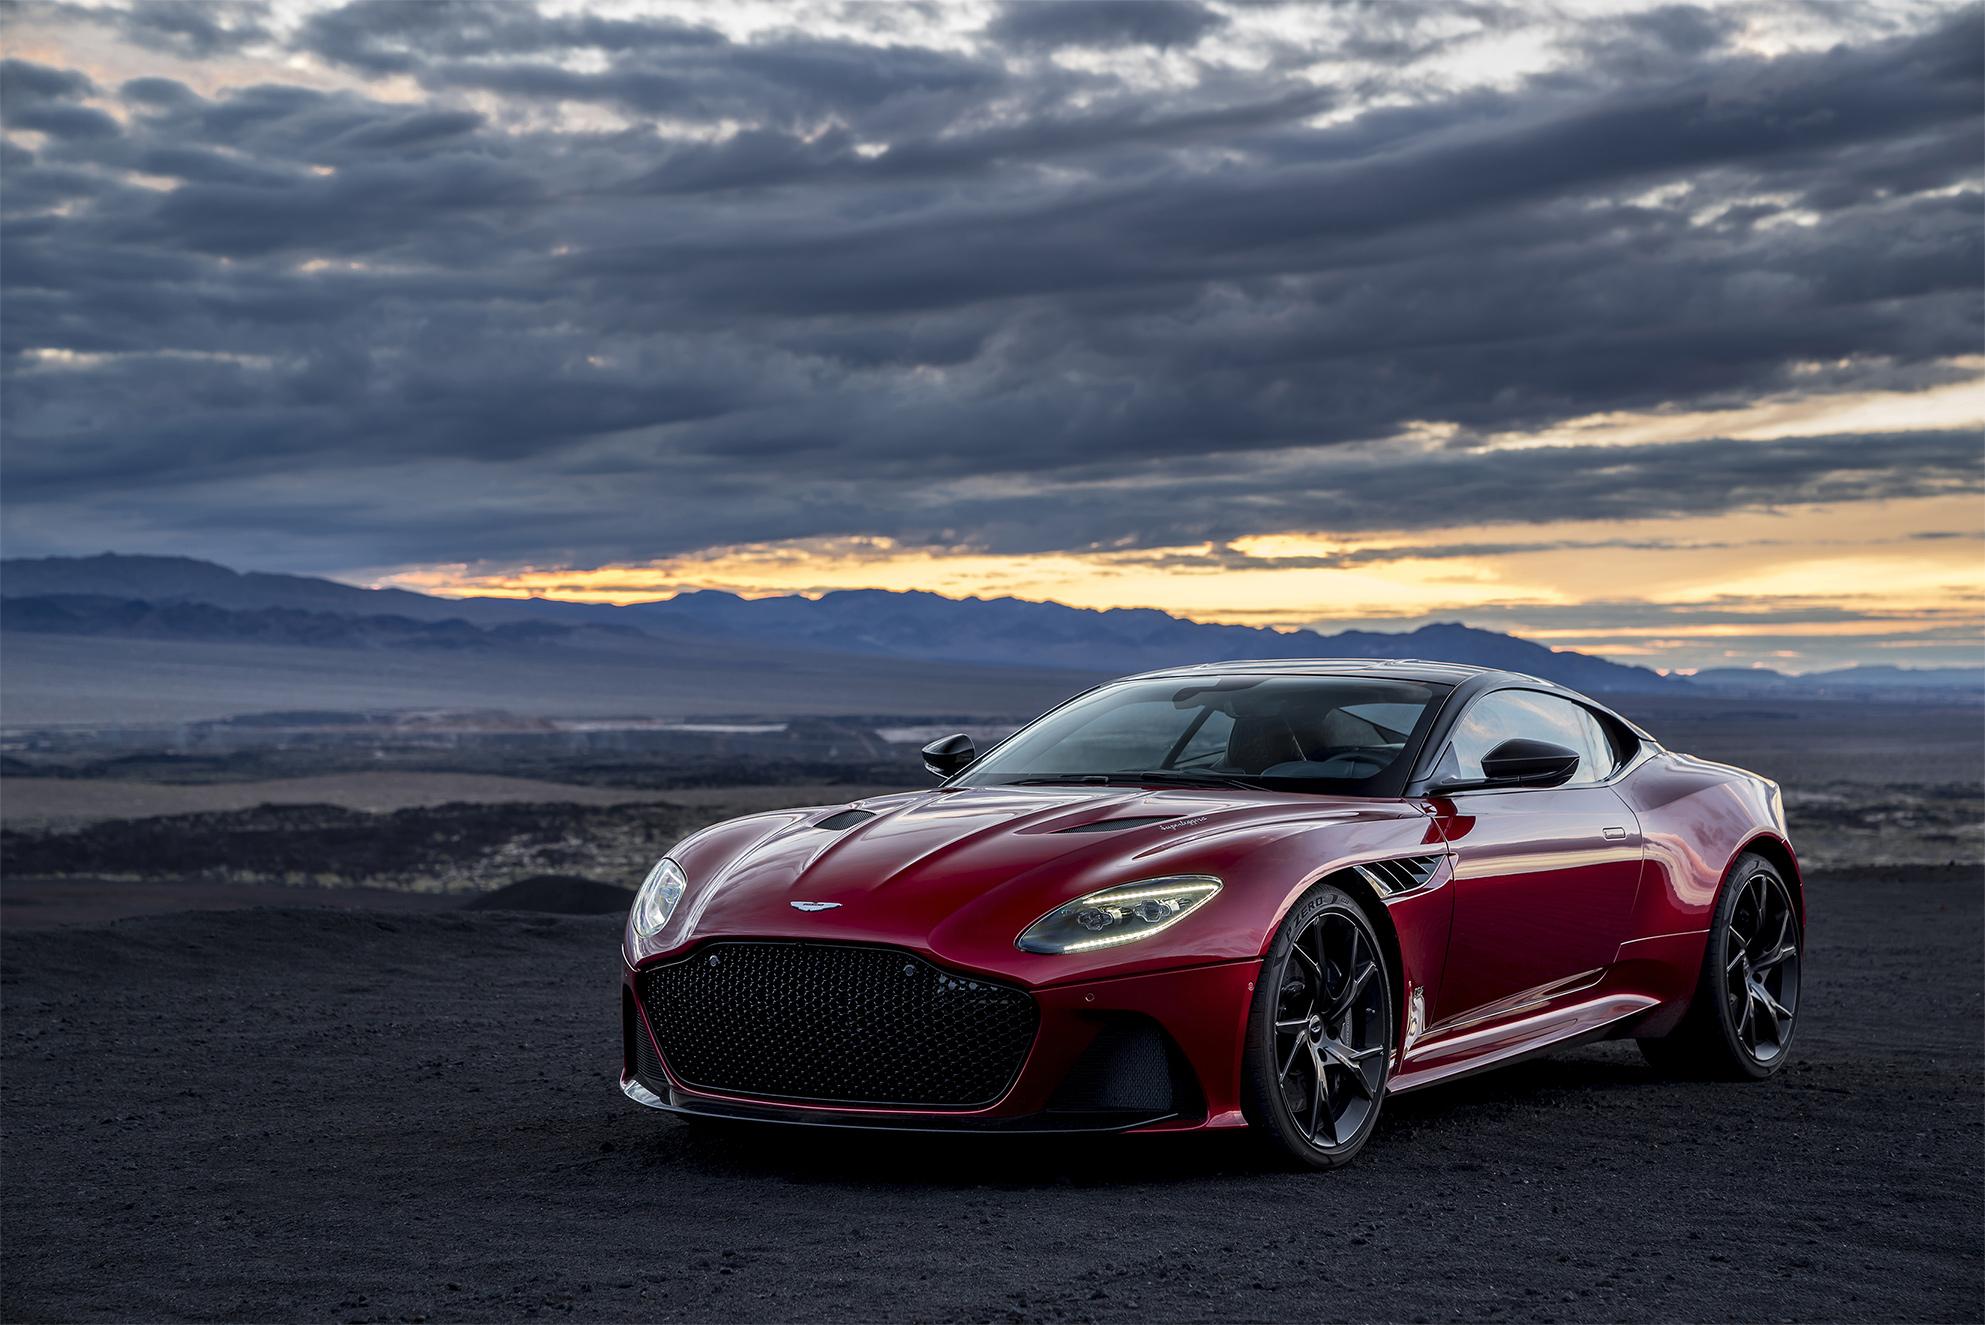 TrackWorthy - Aston Martin DBS Superleggera (1)